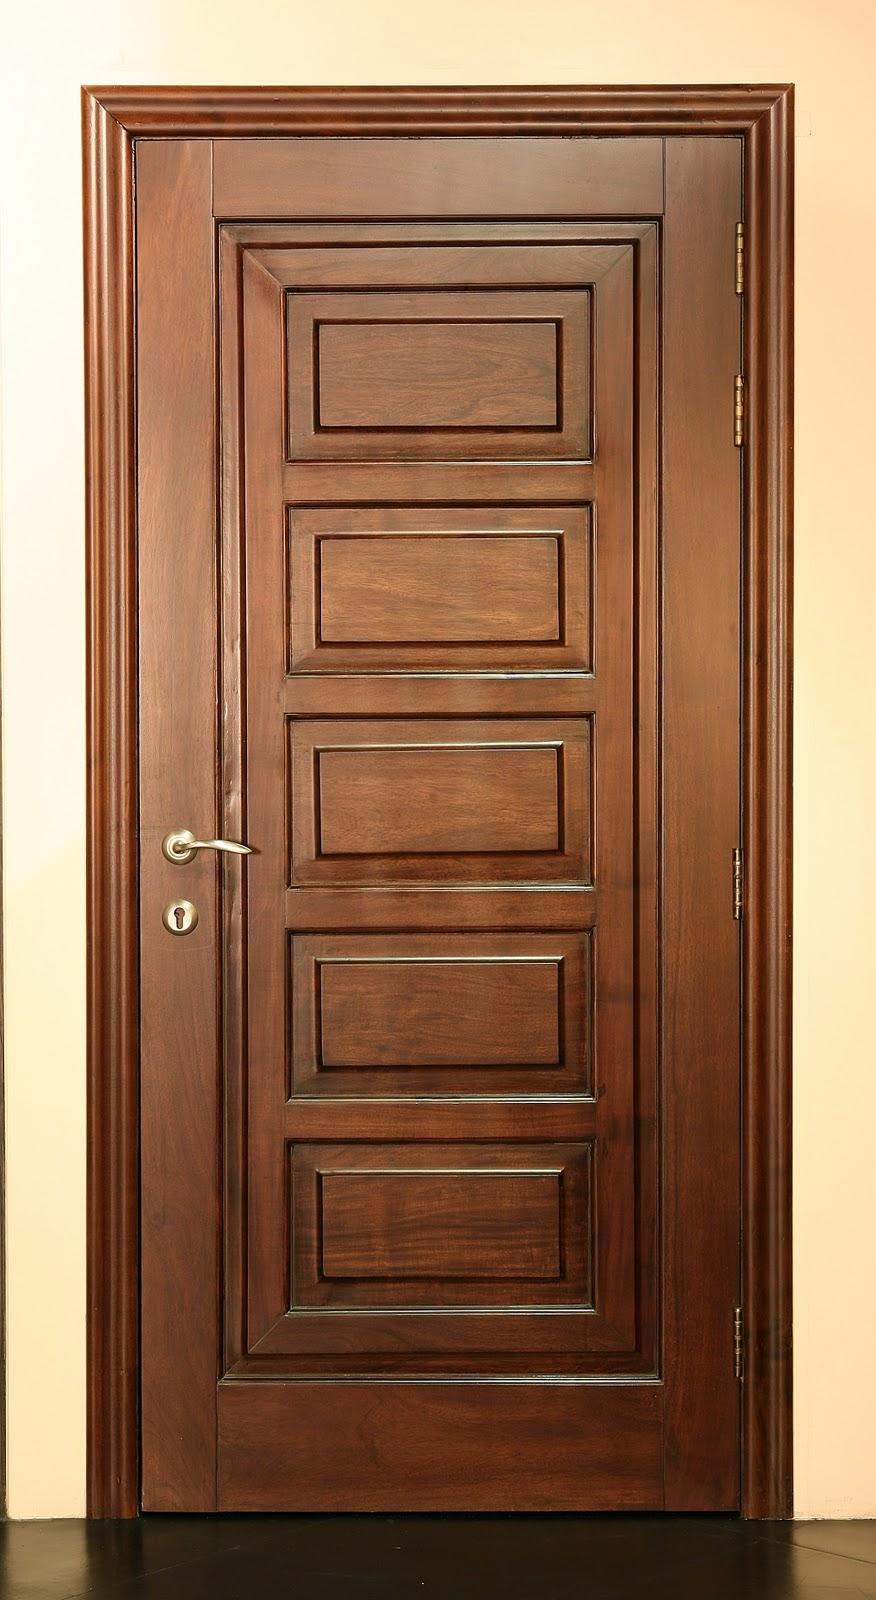 groves doors groves interior